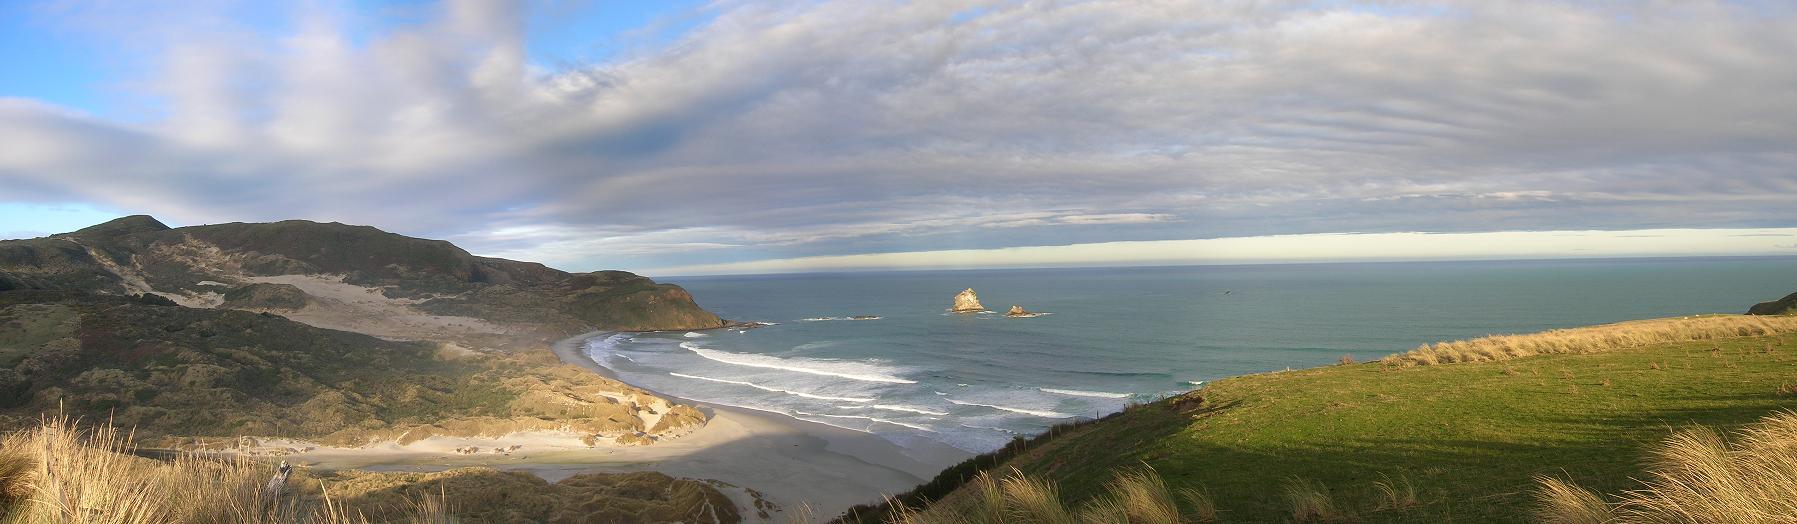 Sandfly Bay Panorama